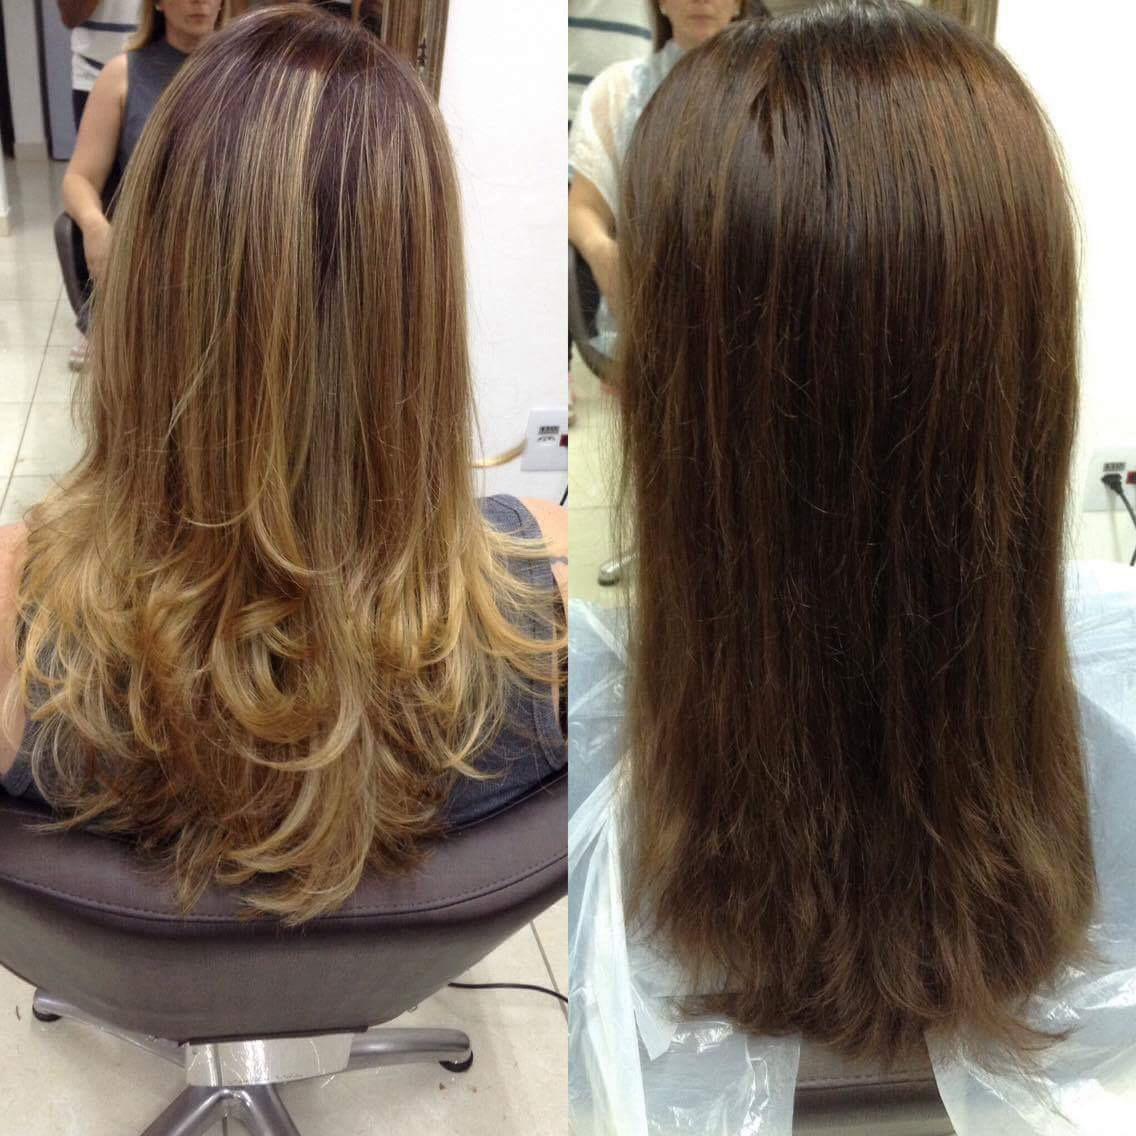 Valorizando a cor e o corte  cabelo cabeleireiro(a) maquiador(a) designer de sobrancelhas